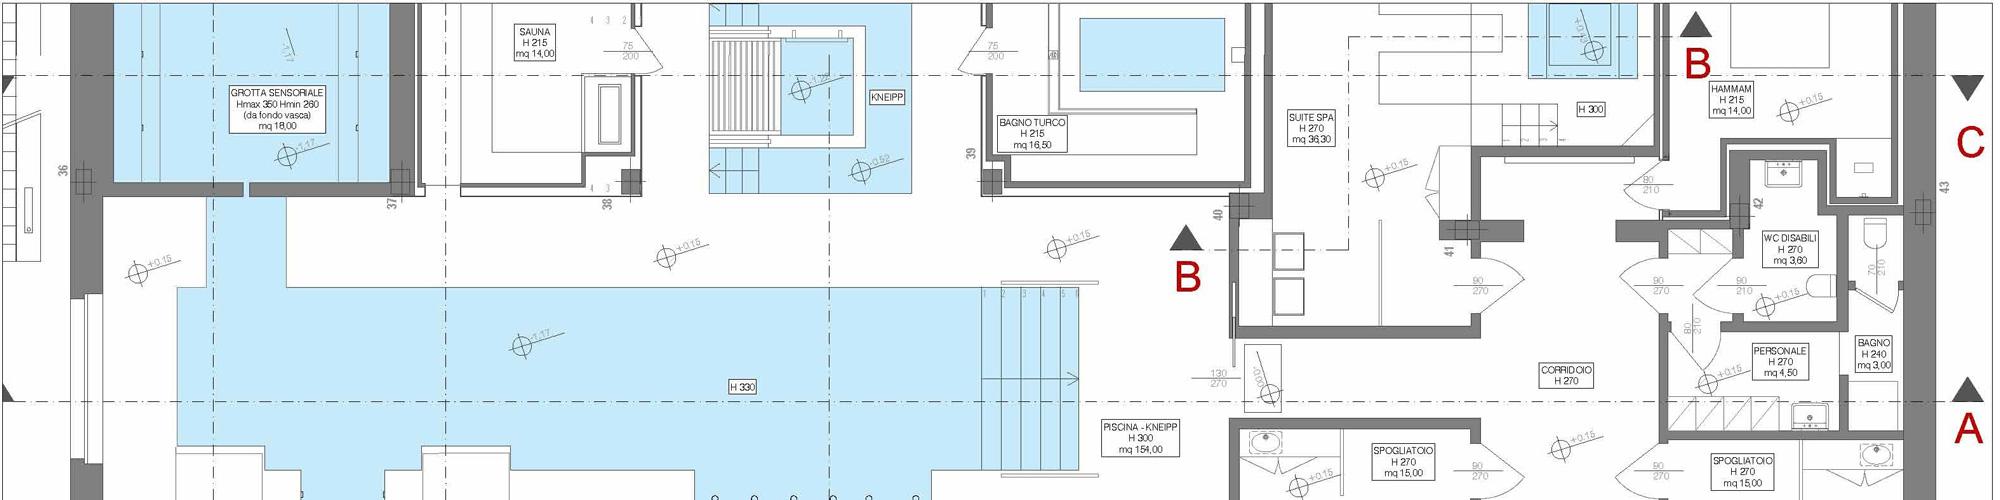 Pianta architettura spa